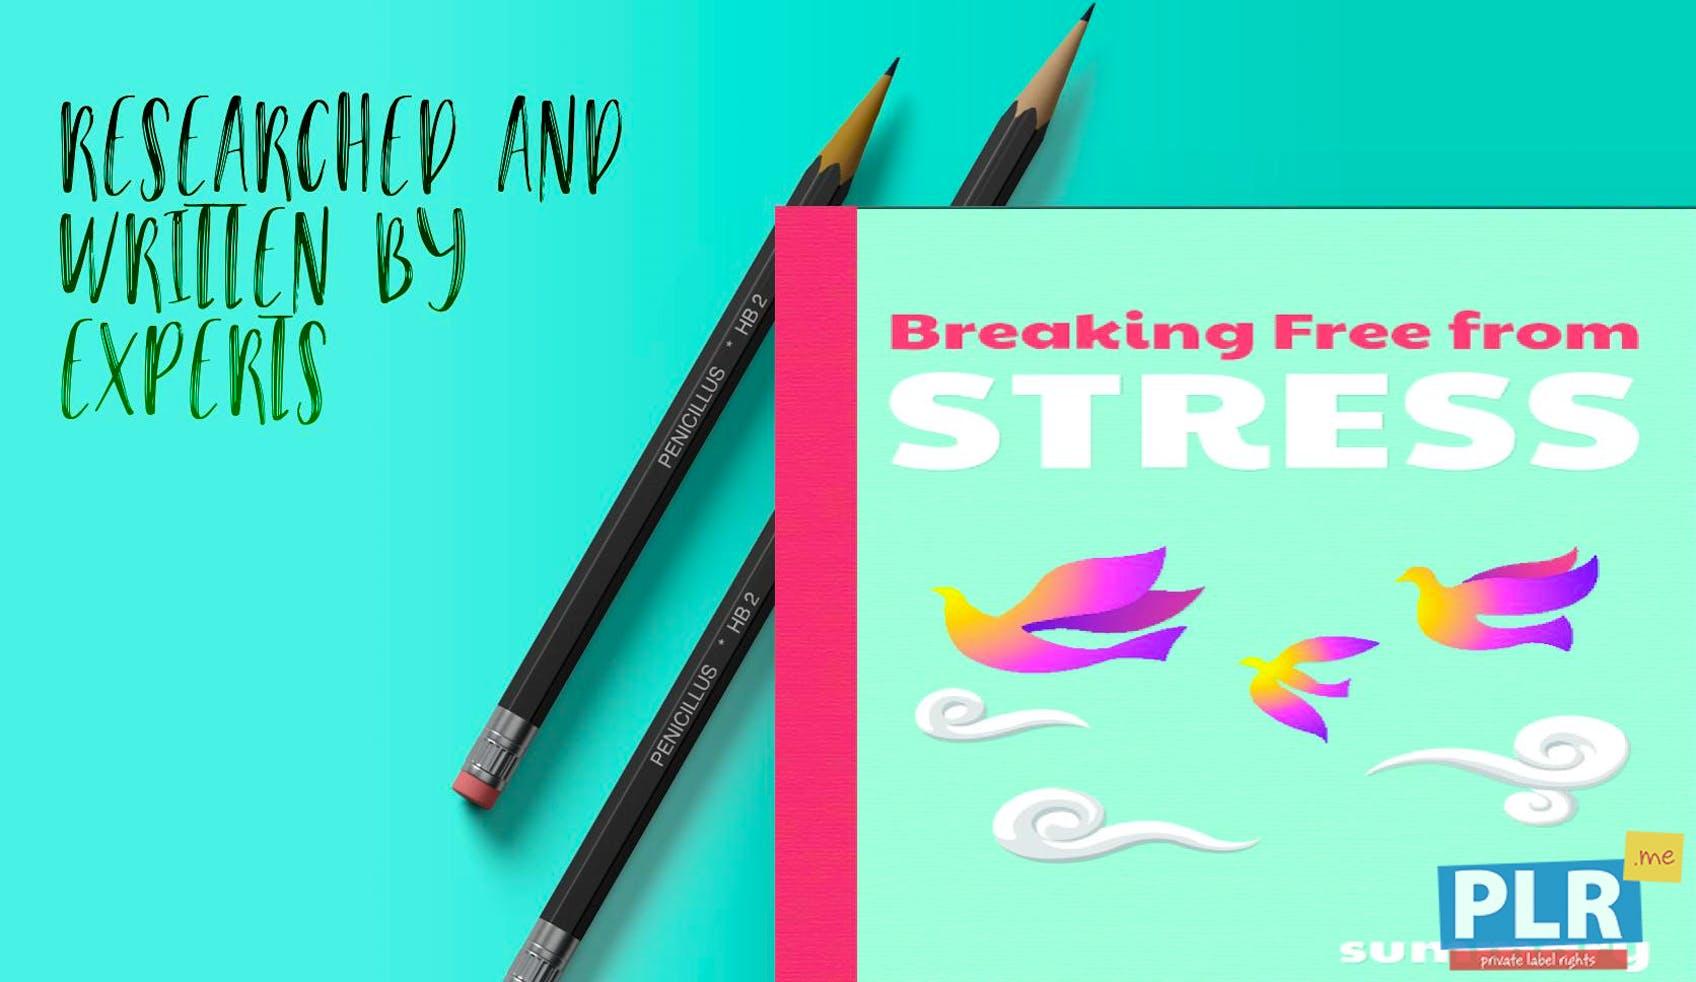 Breaking Free From Stress Executive Summary